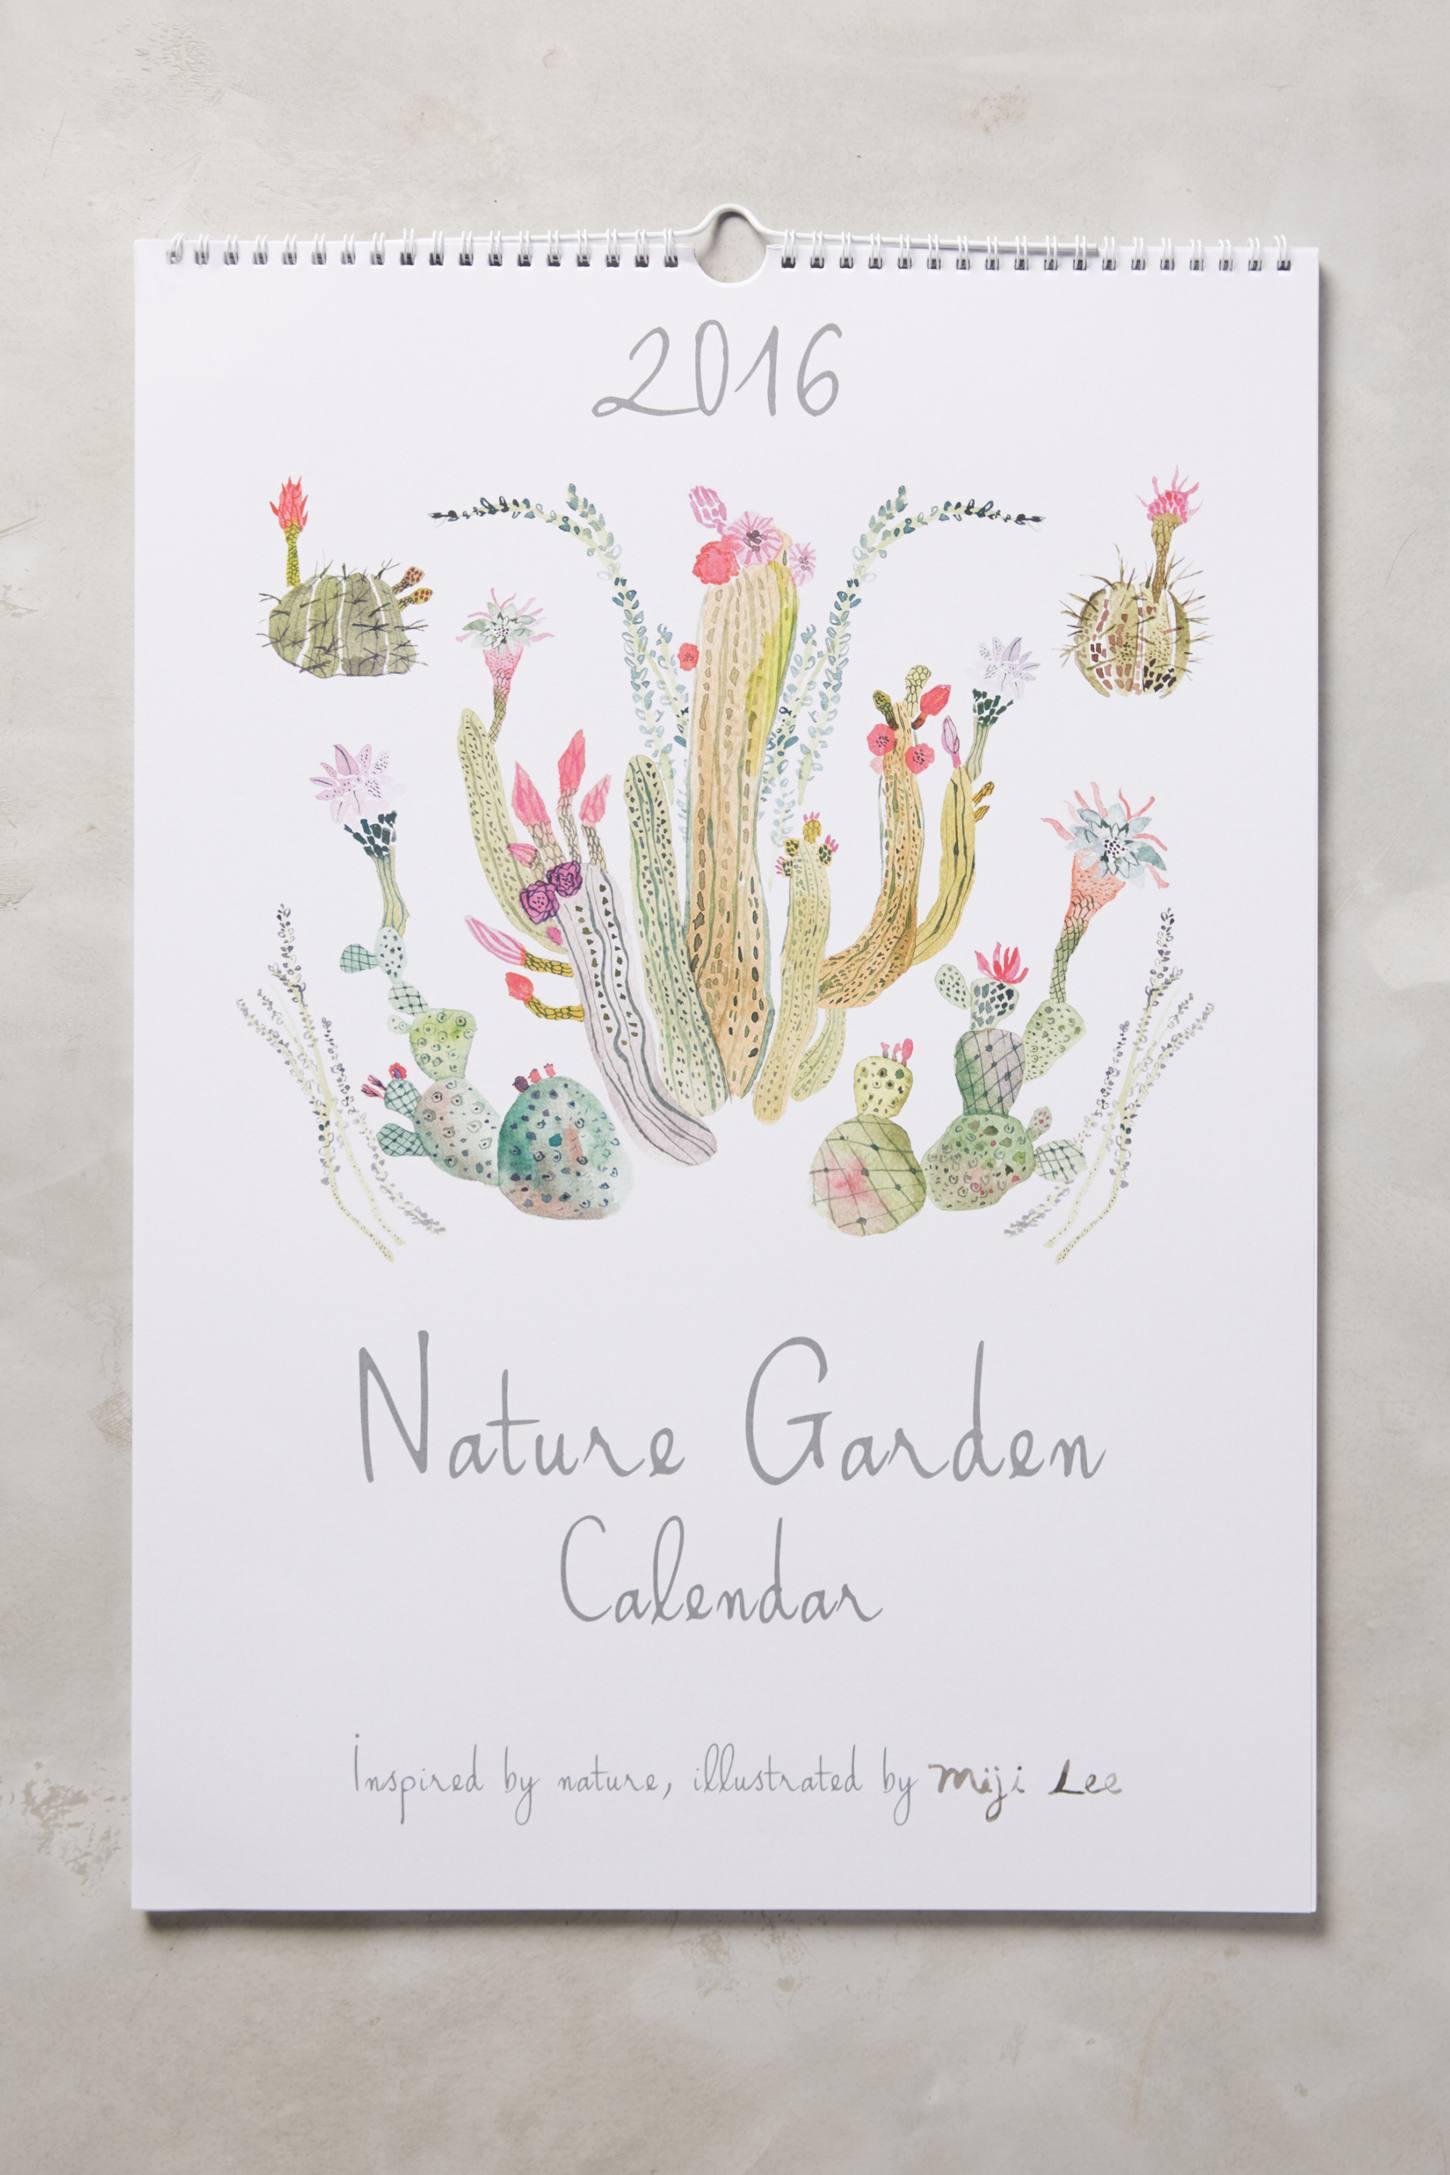 Nature Garden 2016 Calendar